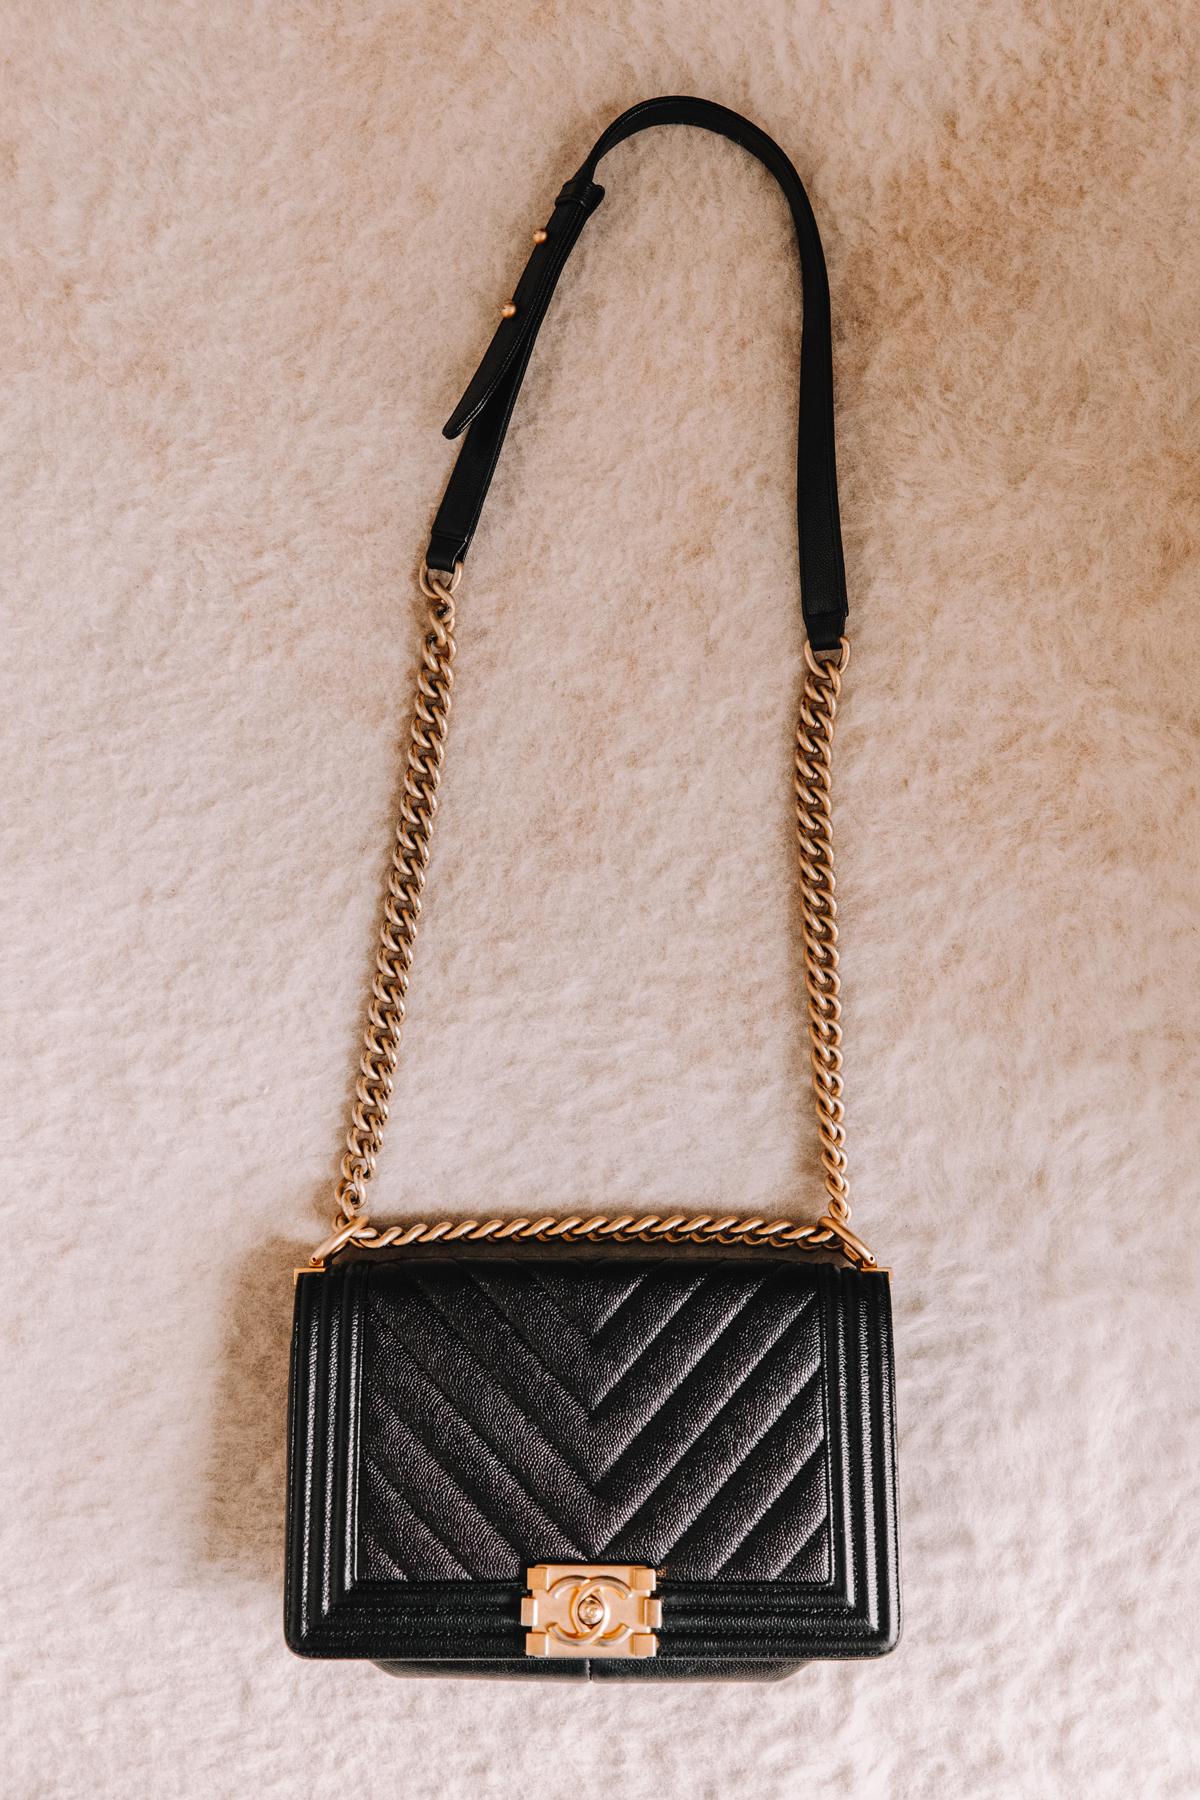 Fashion Jackson Chanel Boy Bag Chevron Old Medium Black 2